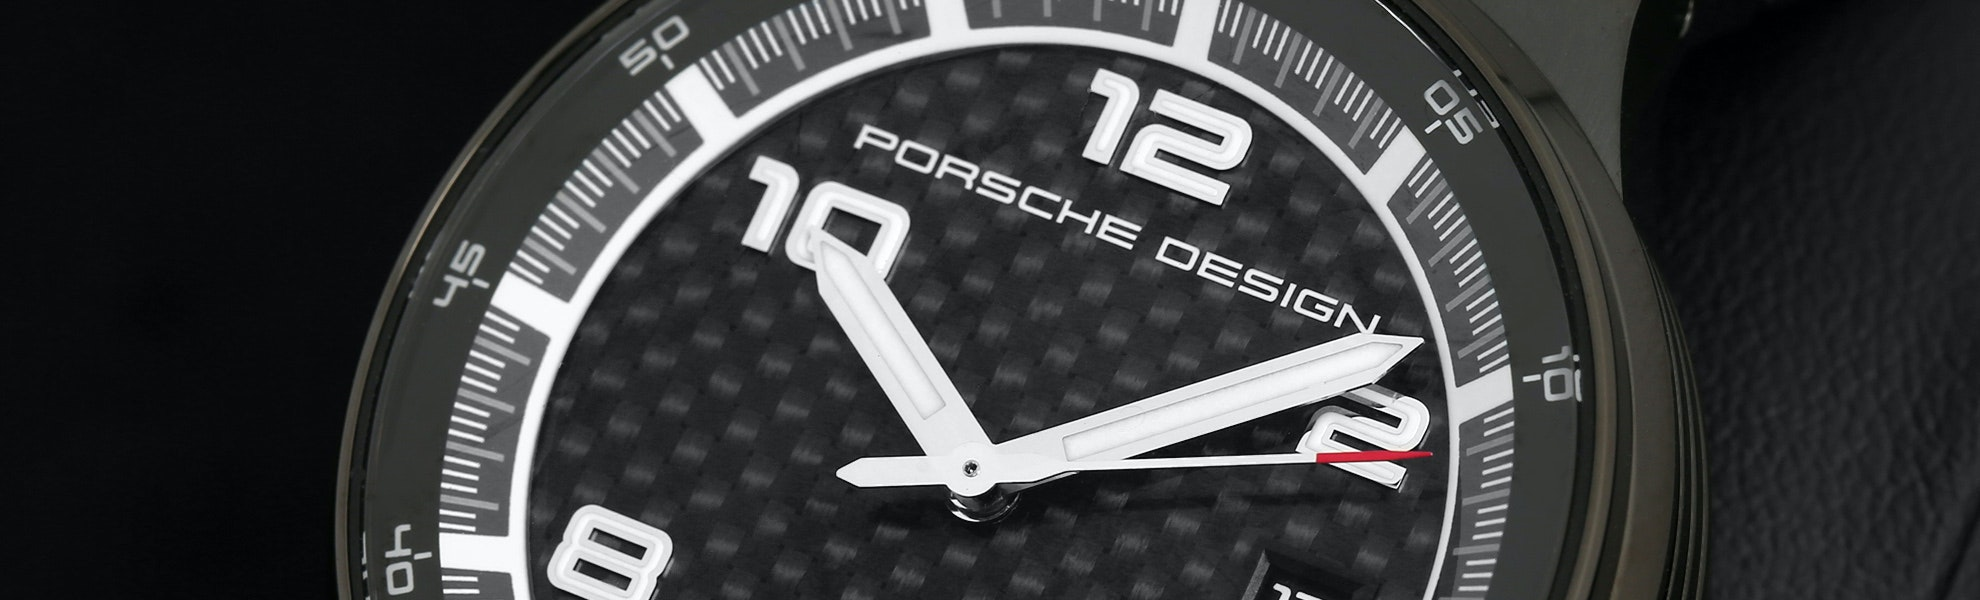 Porsche Design P'6351 Flat Six Automatic Watch